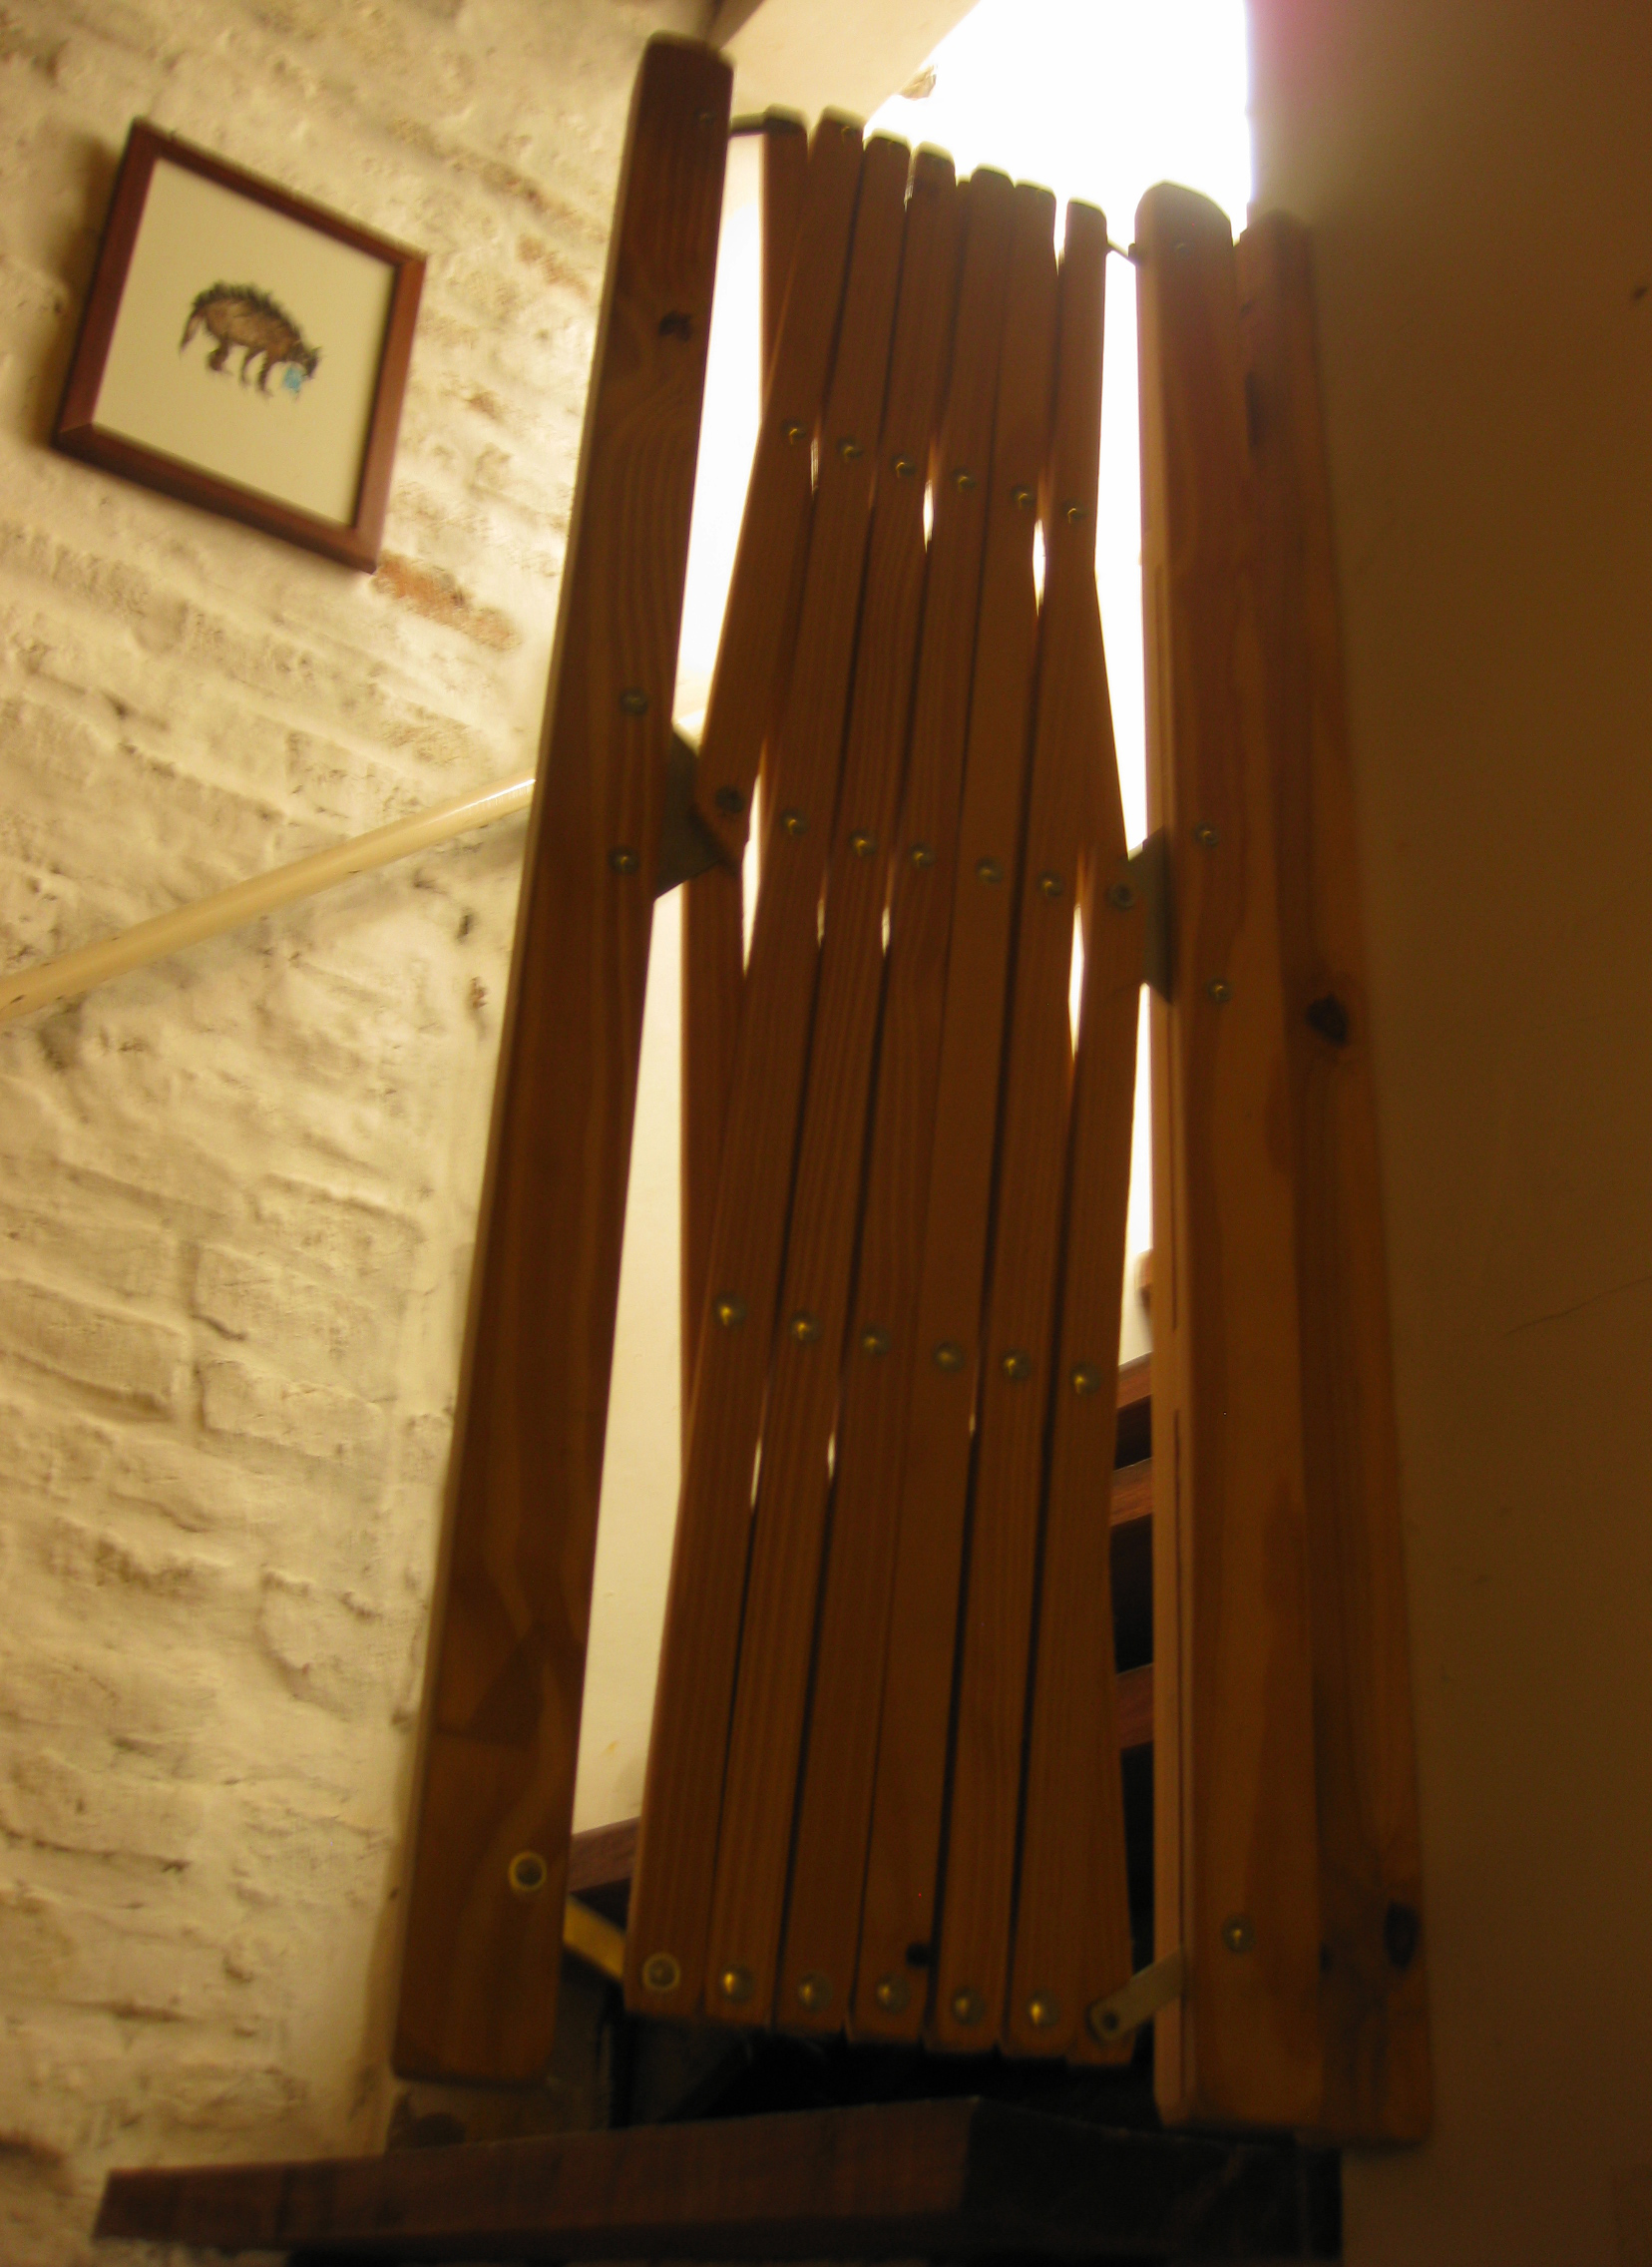 wooden folding baby gates  Stuff for sale at 1468 Ravignani